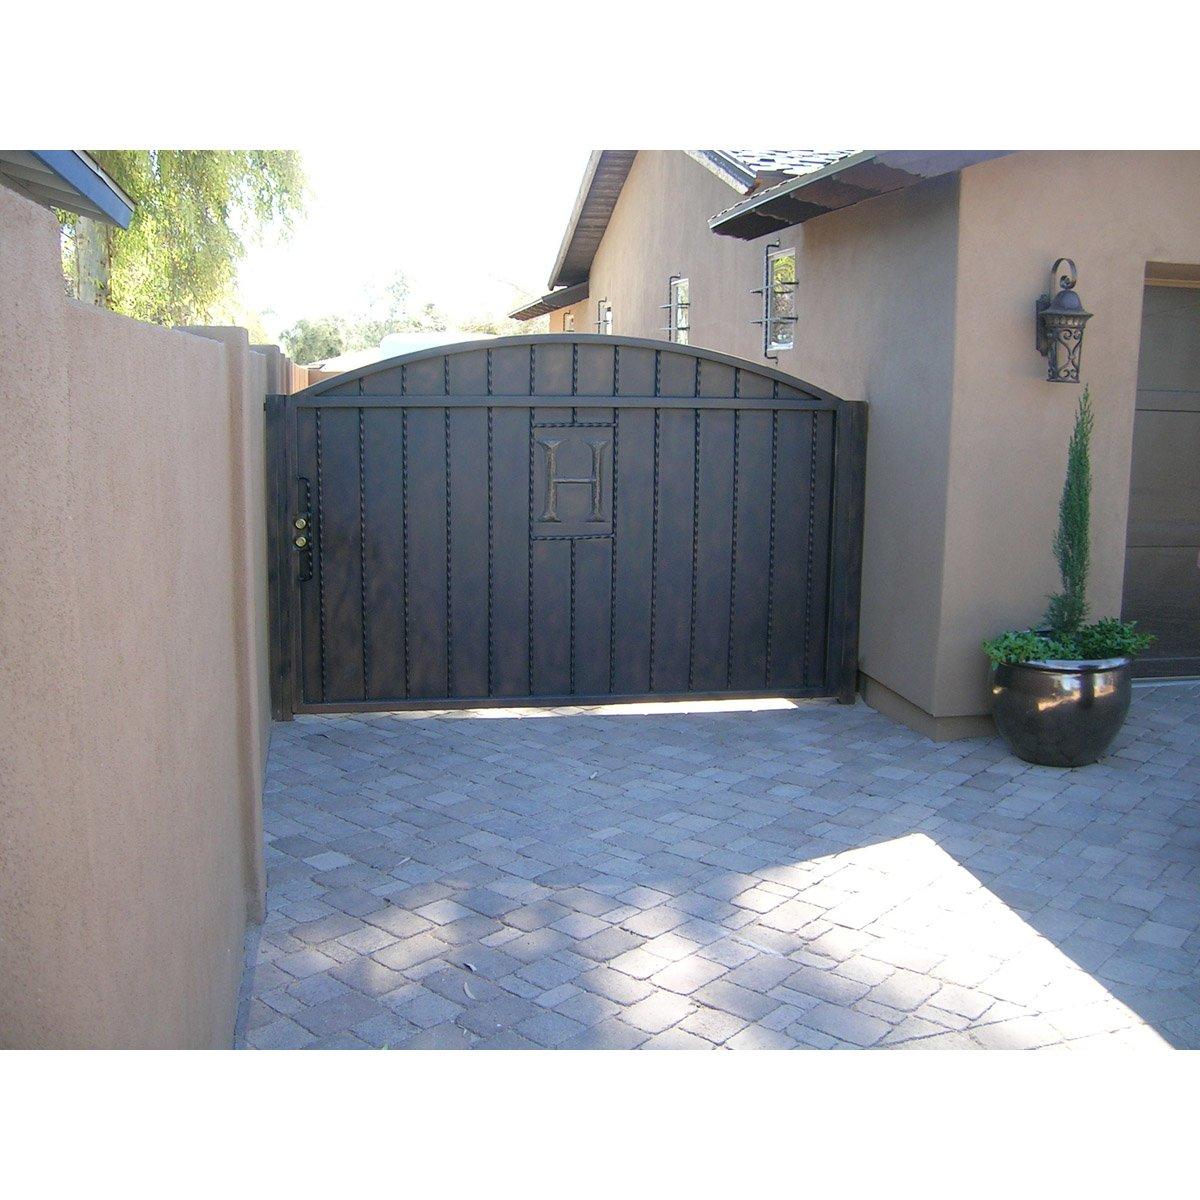 Large Access Gate.jpg